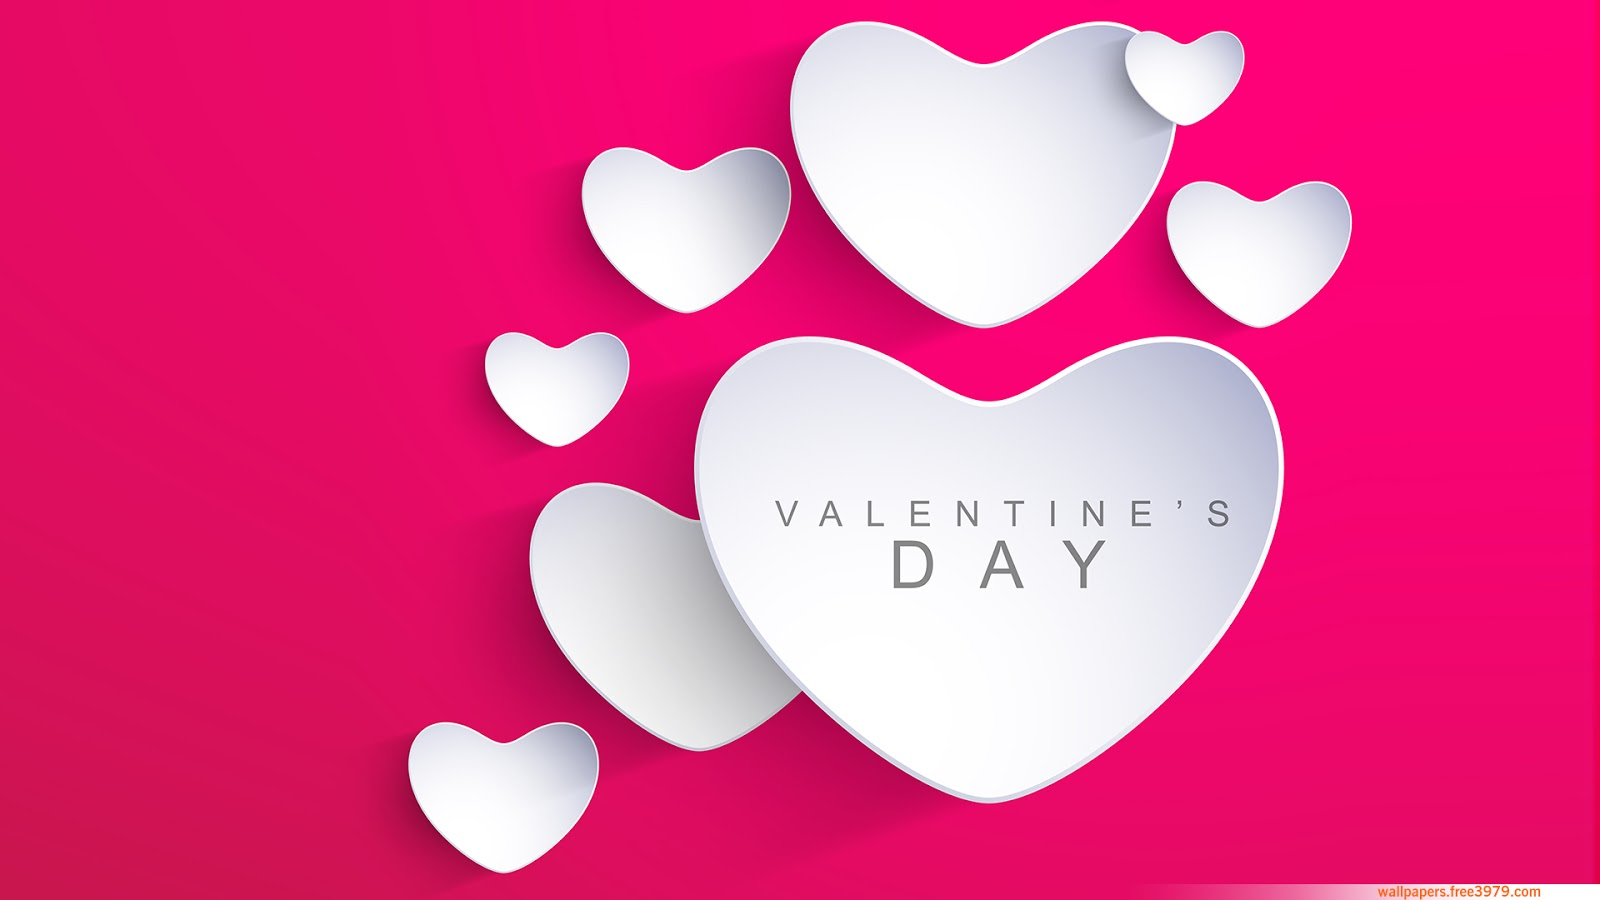 Cute Love Heart Wallpaper: Cute Hearts Wallpaper